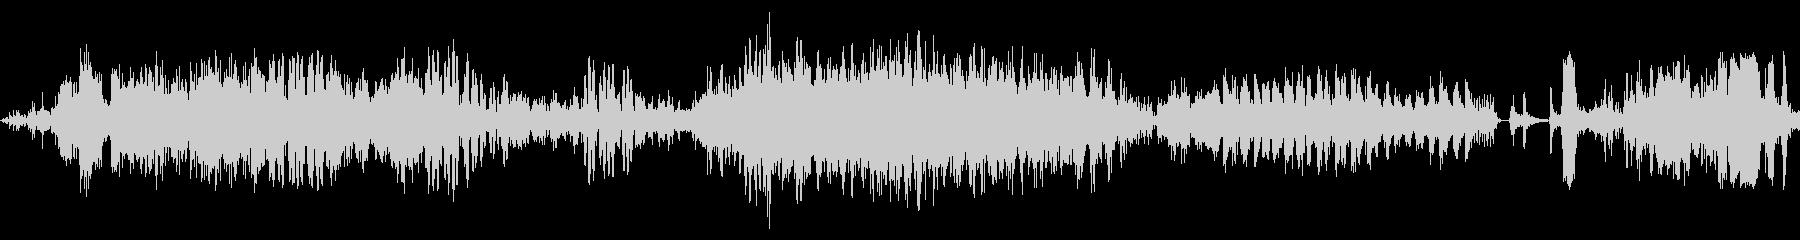 SciFi EC01_83_1の未再生の波形